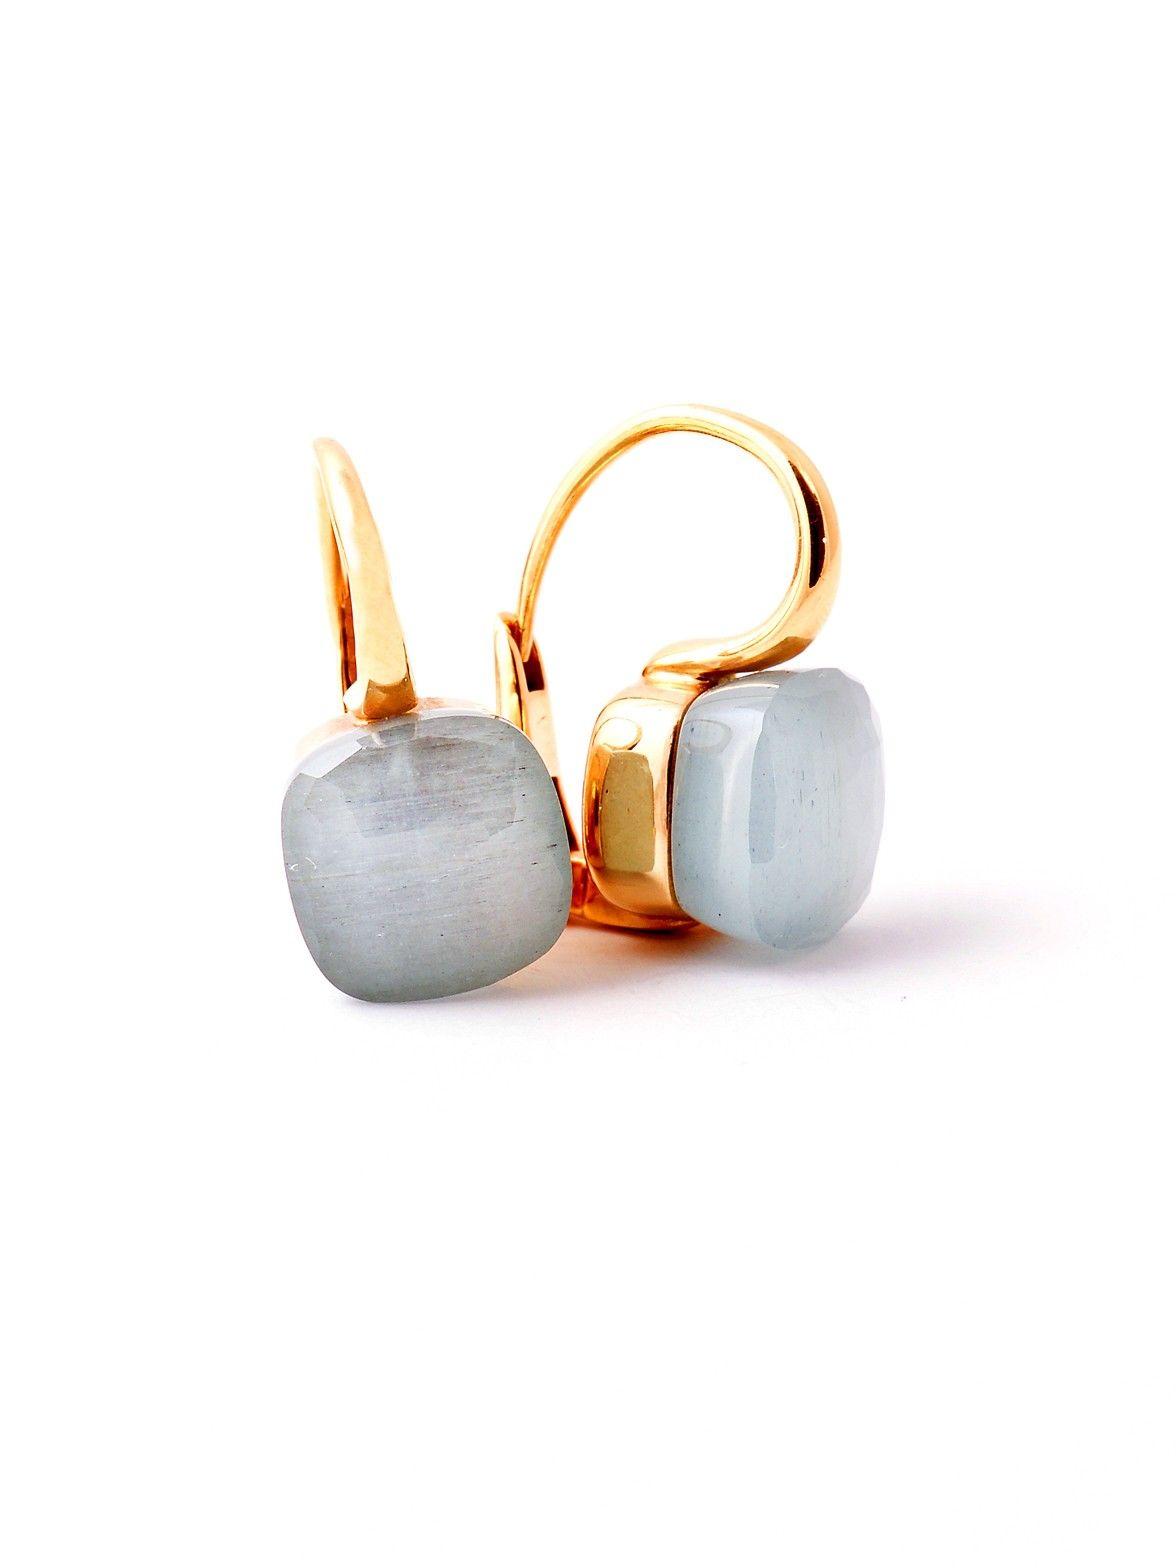 Pomellato Nudo Milky Aquamarine Earrings at London Jewelers!